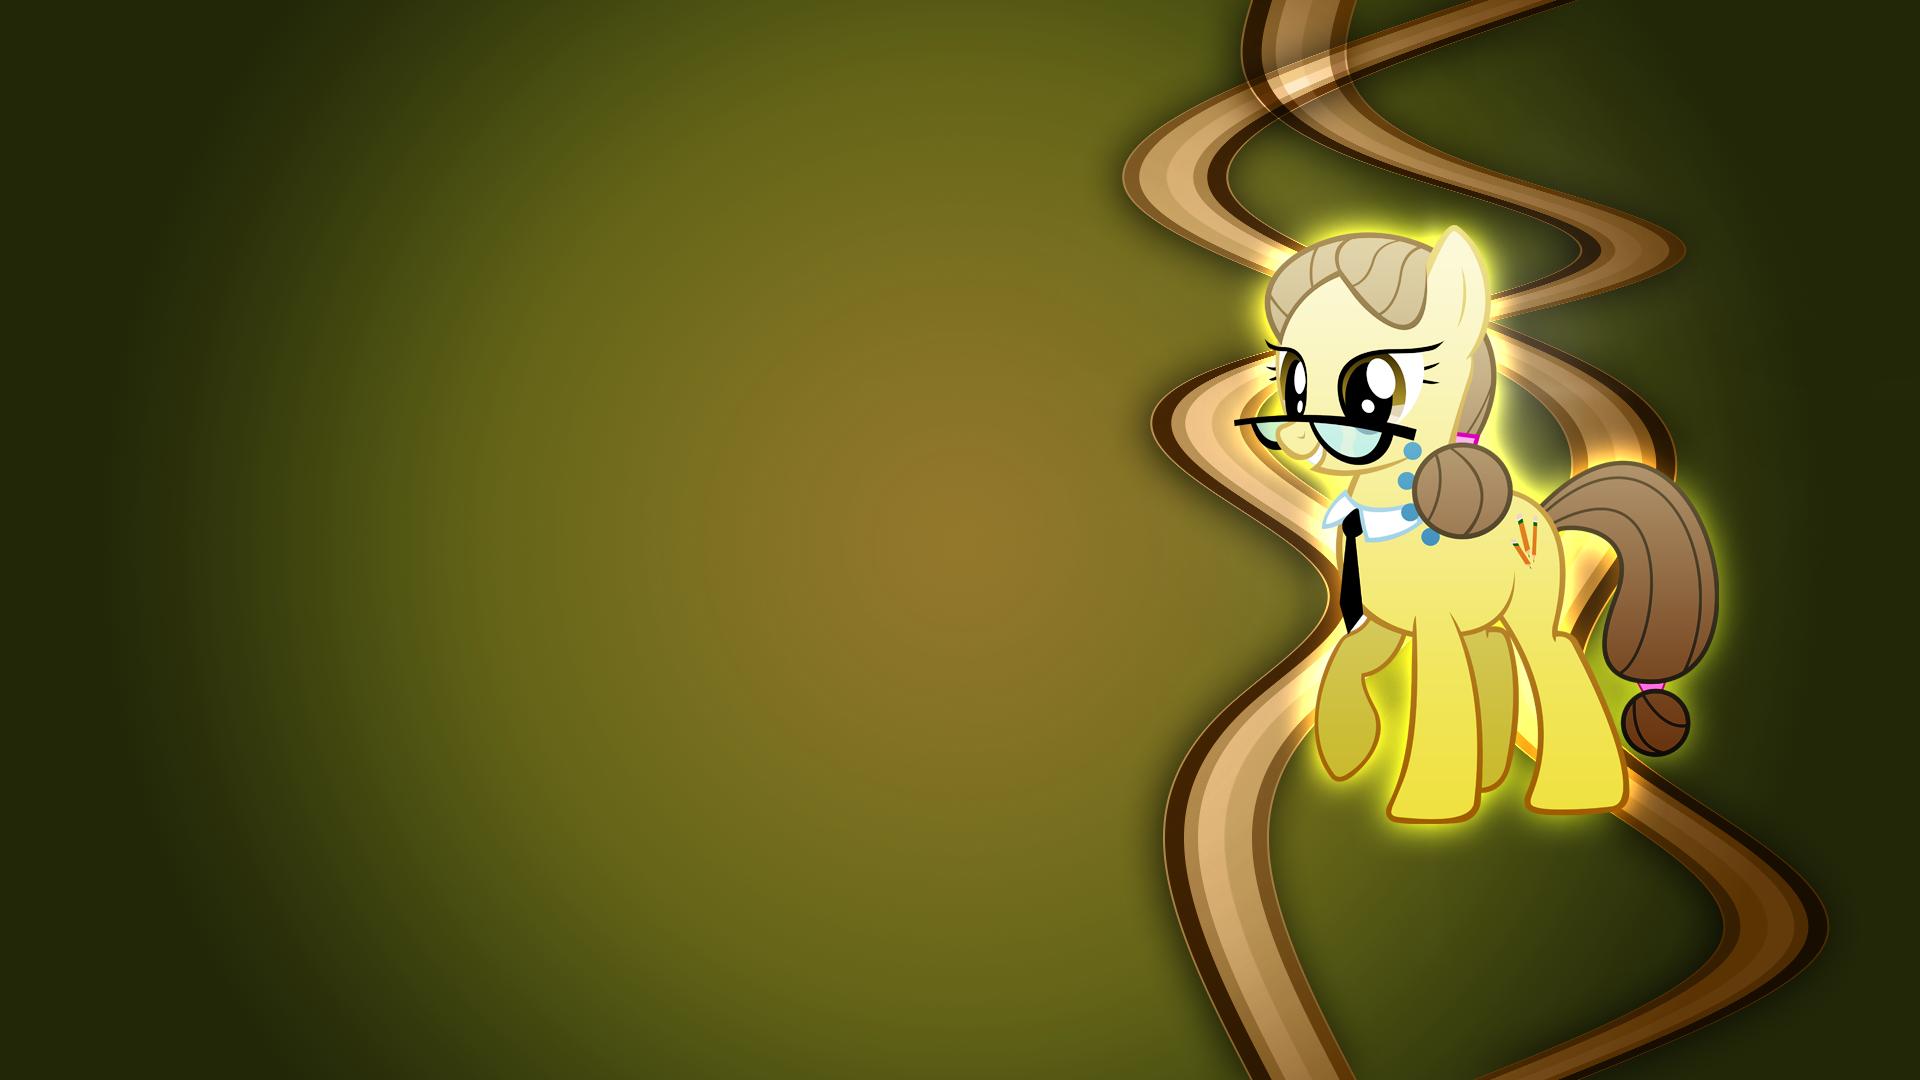 BG Ponies - Pony Teacher by Episkopi and Peachspices